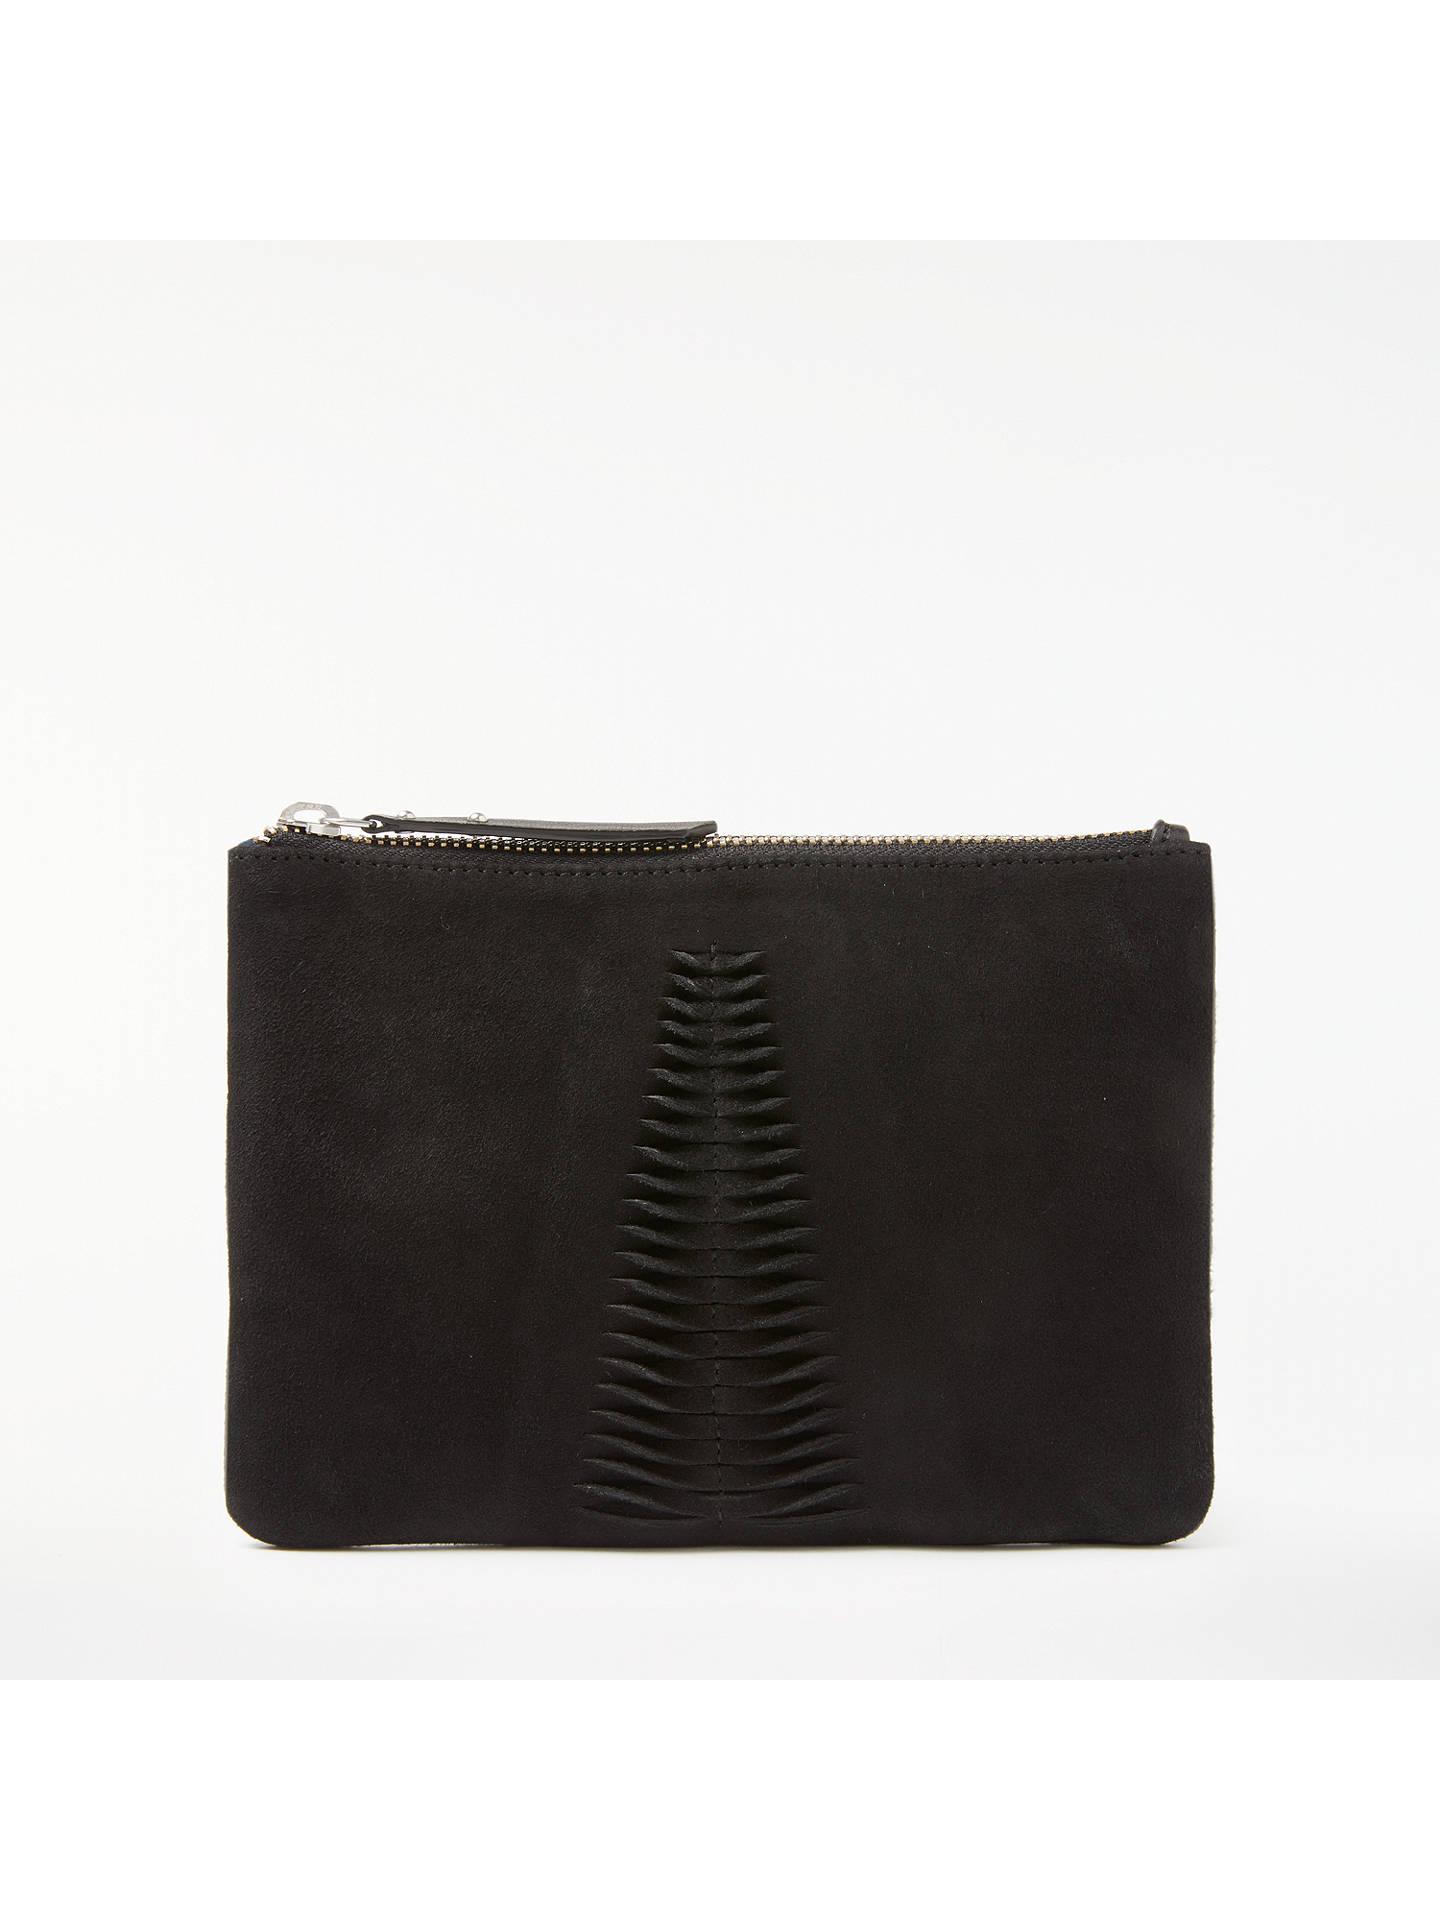 Bag Adria Becksondergaard Partners Clutch amp; At John Lewis xxBErdnzwq